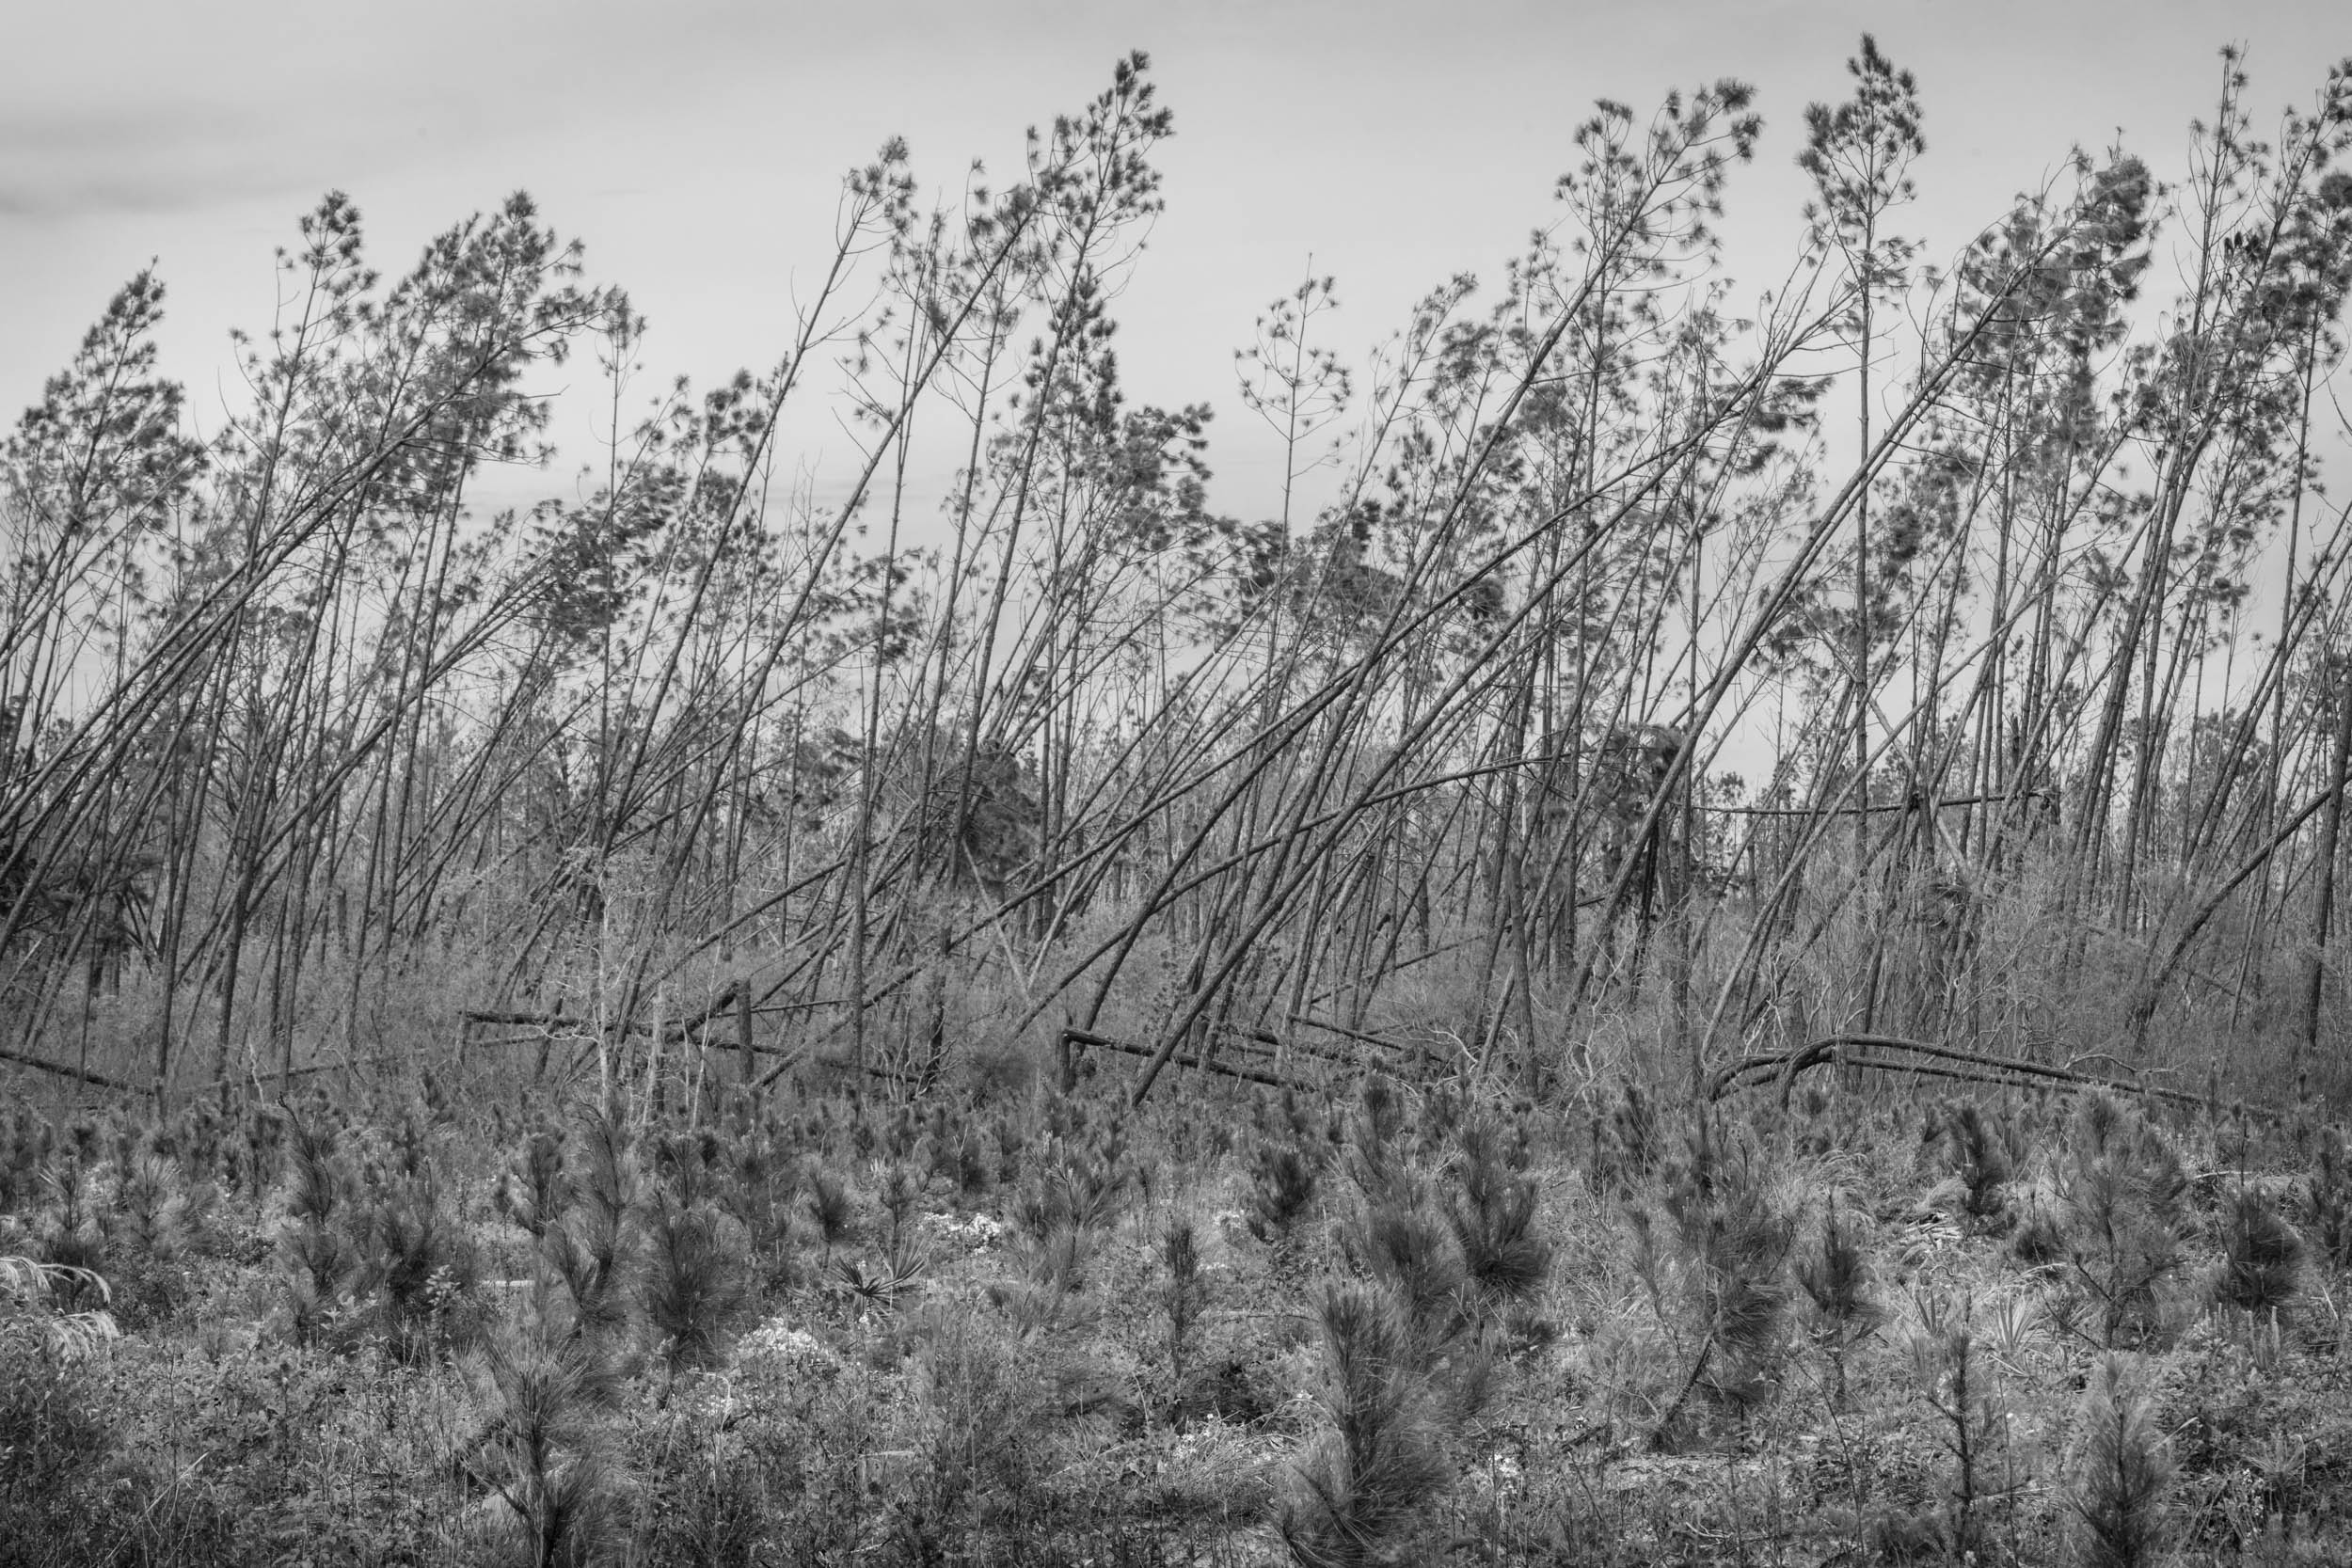 Juvenile Pines